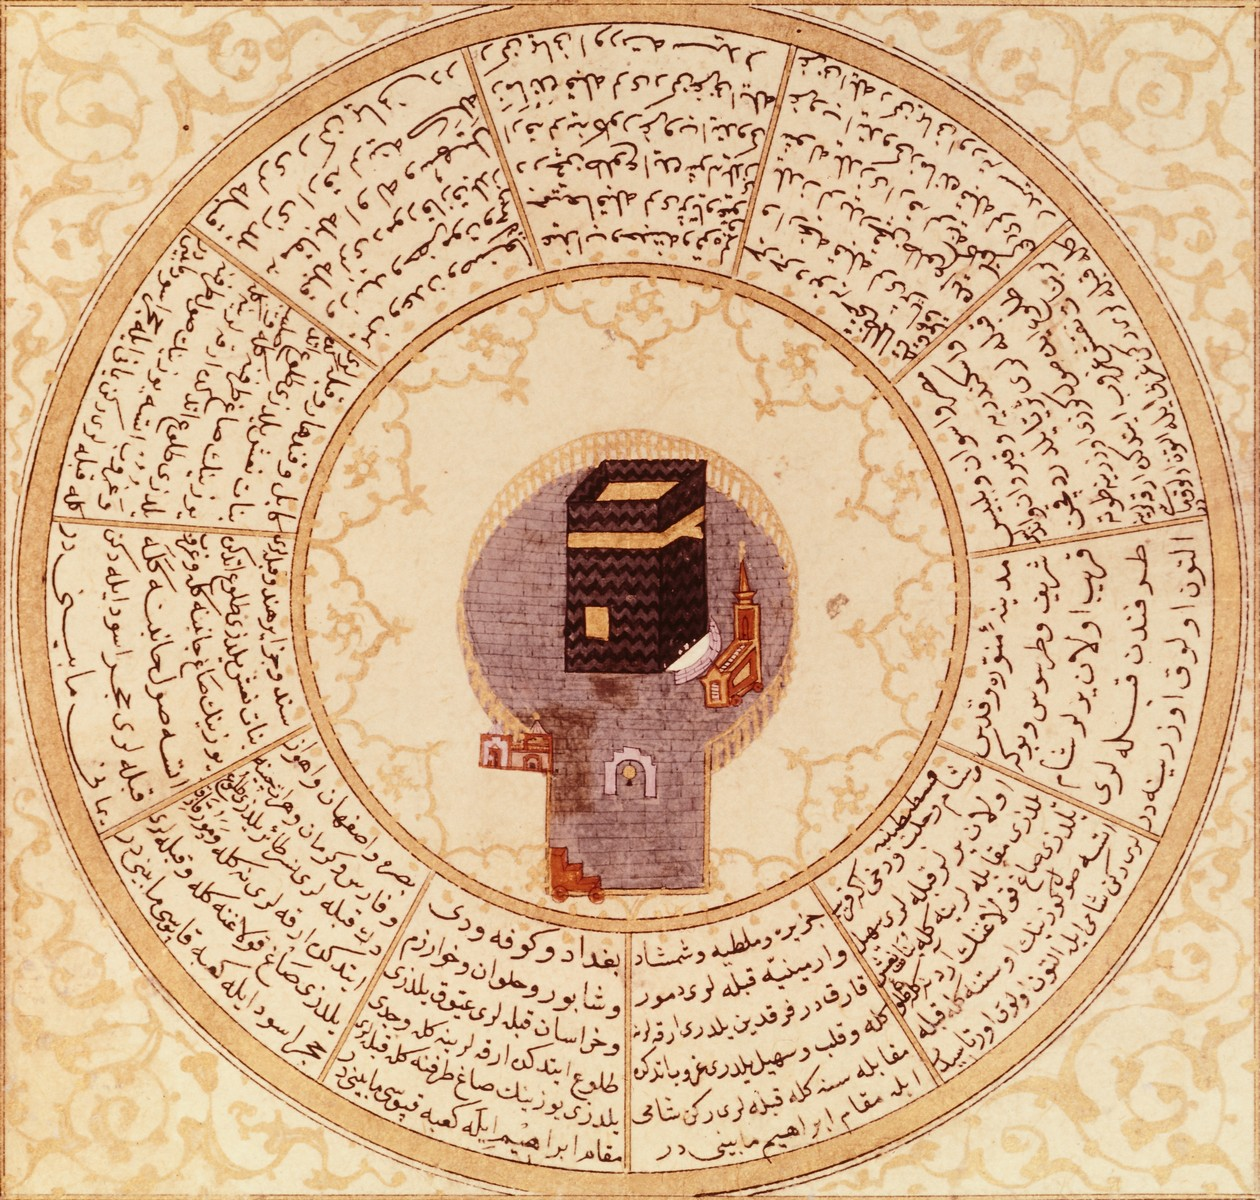 Copy of World Languages & Literature